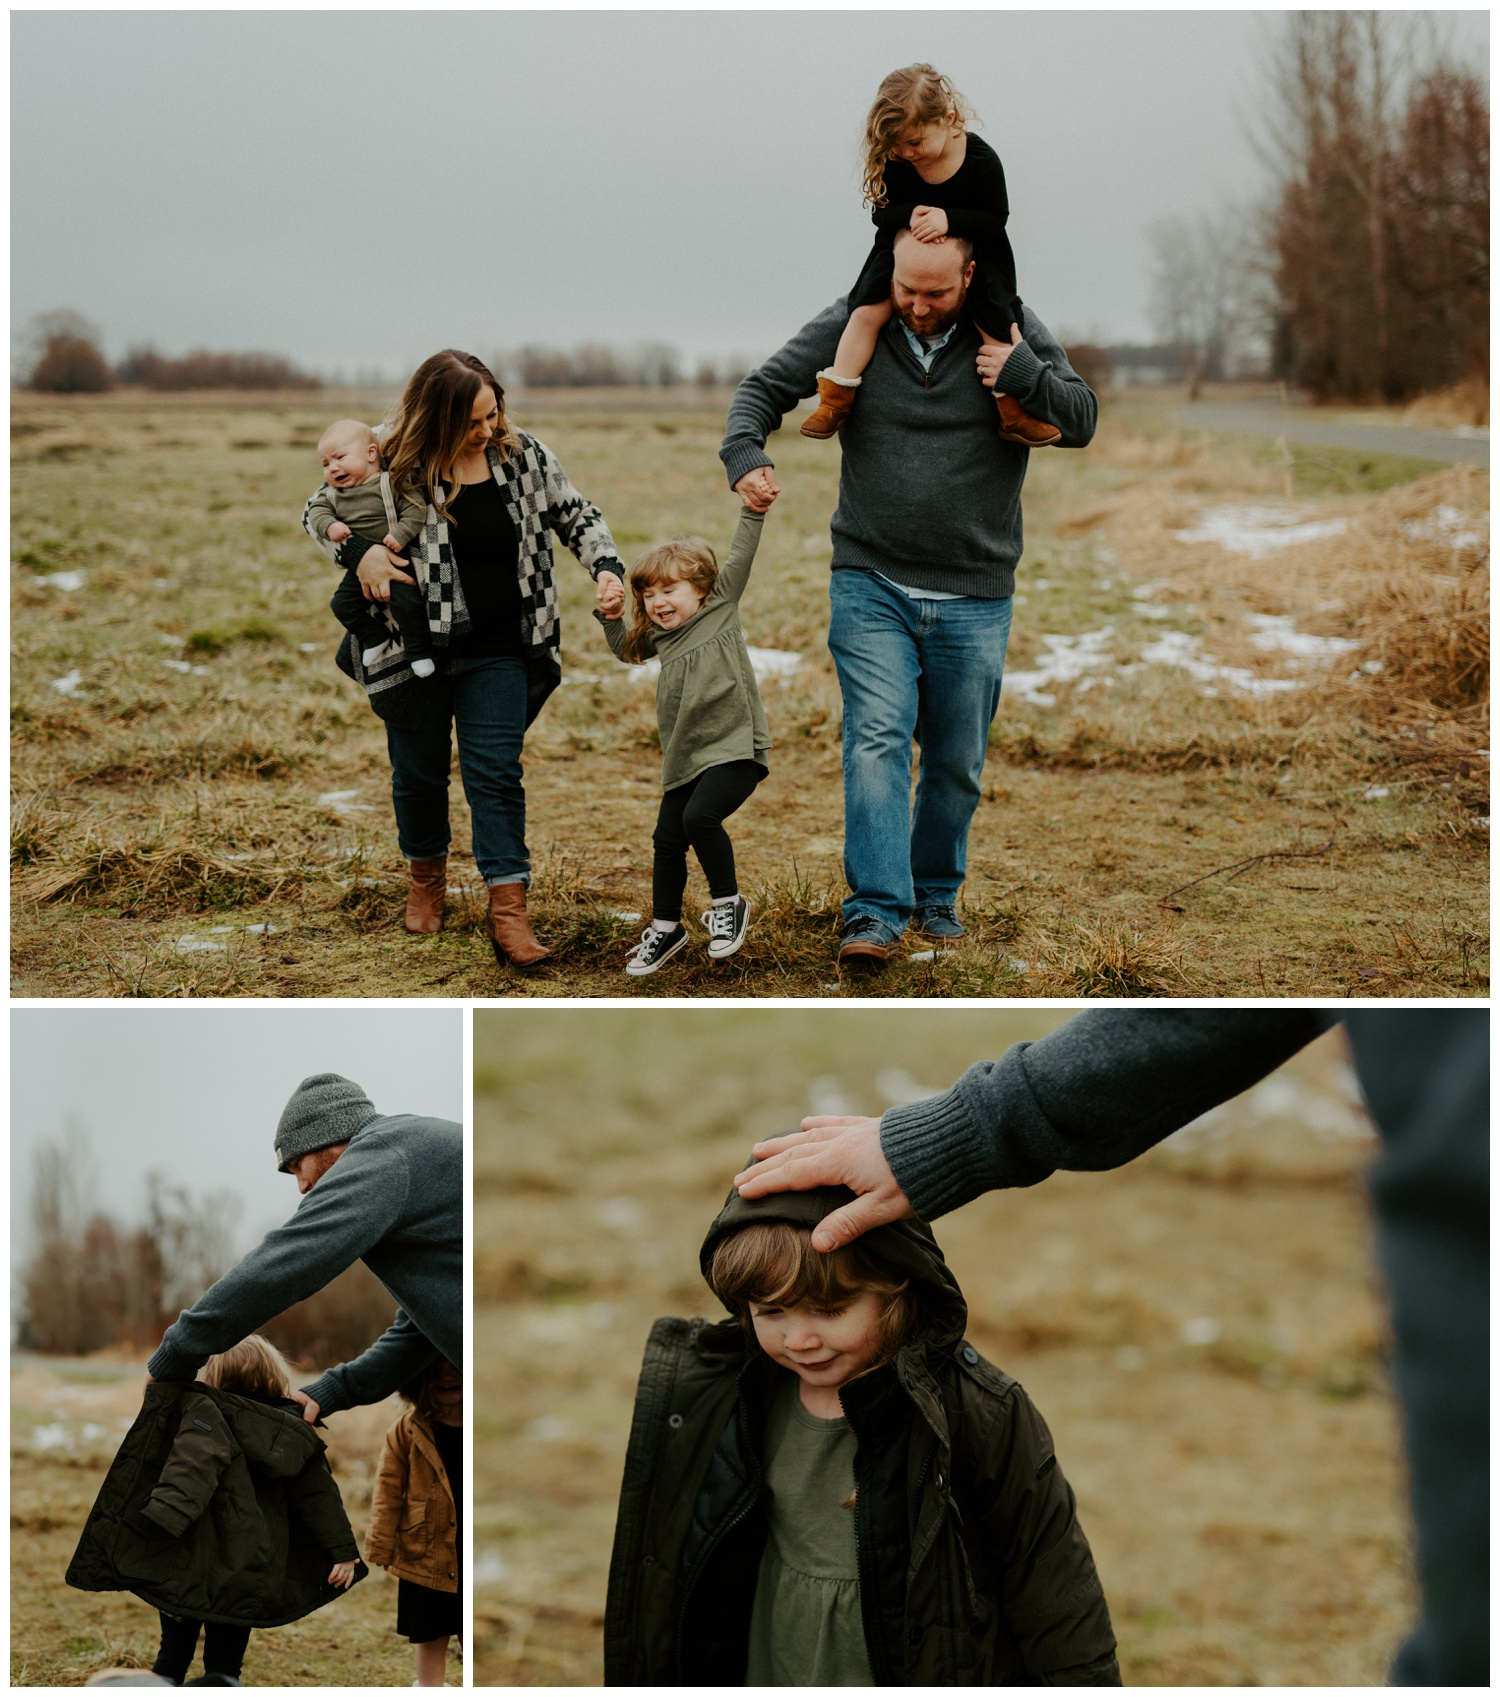 Olympia Washington Family photos in a foggy field | Jessica Heron Images | jessicaheronimages.com 007.JPG